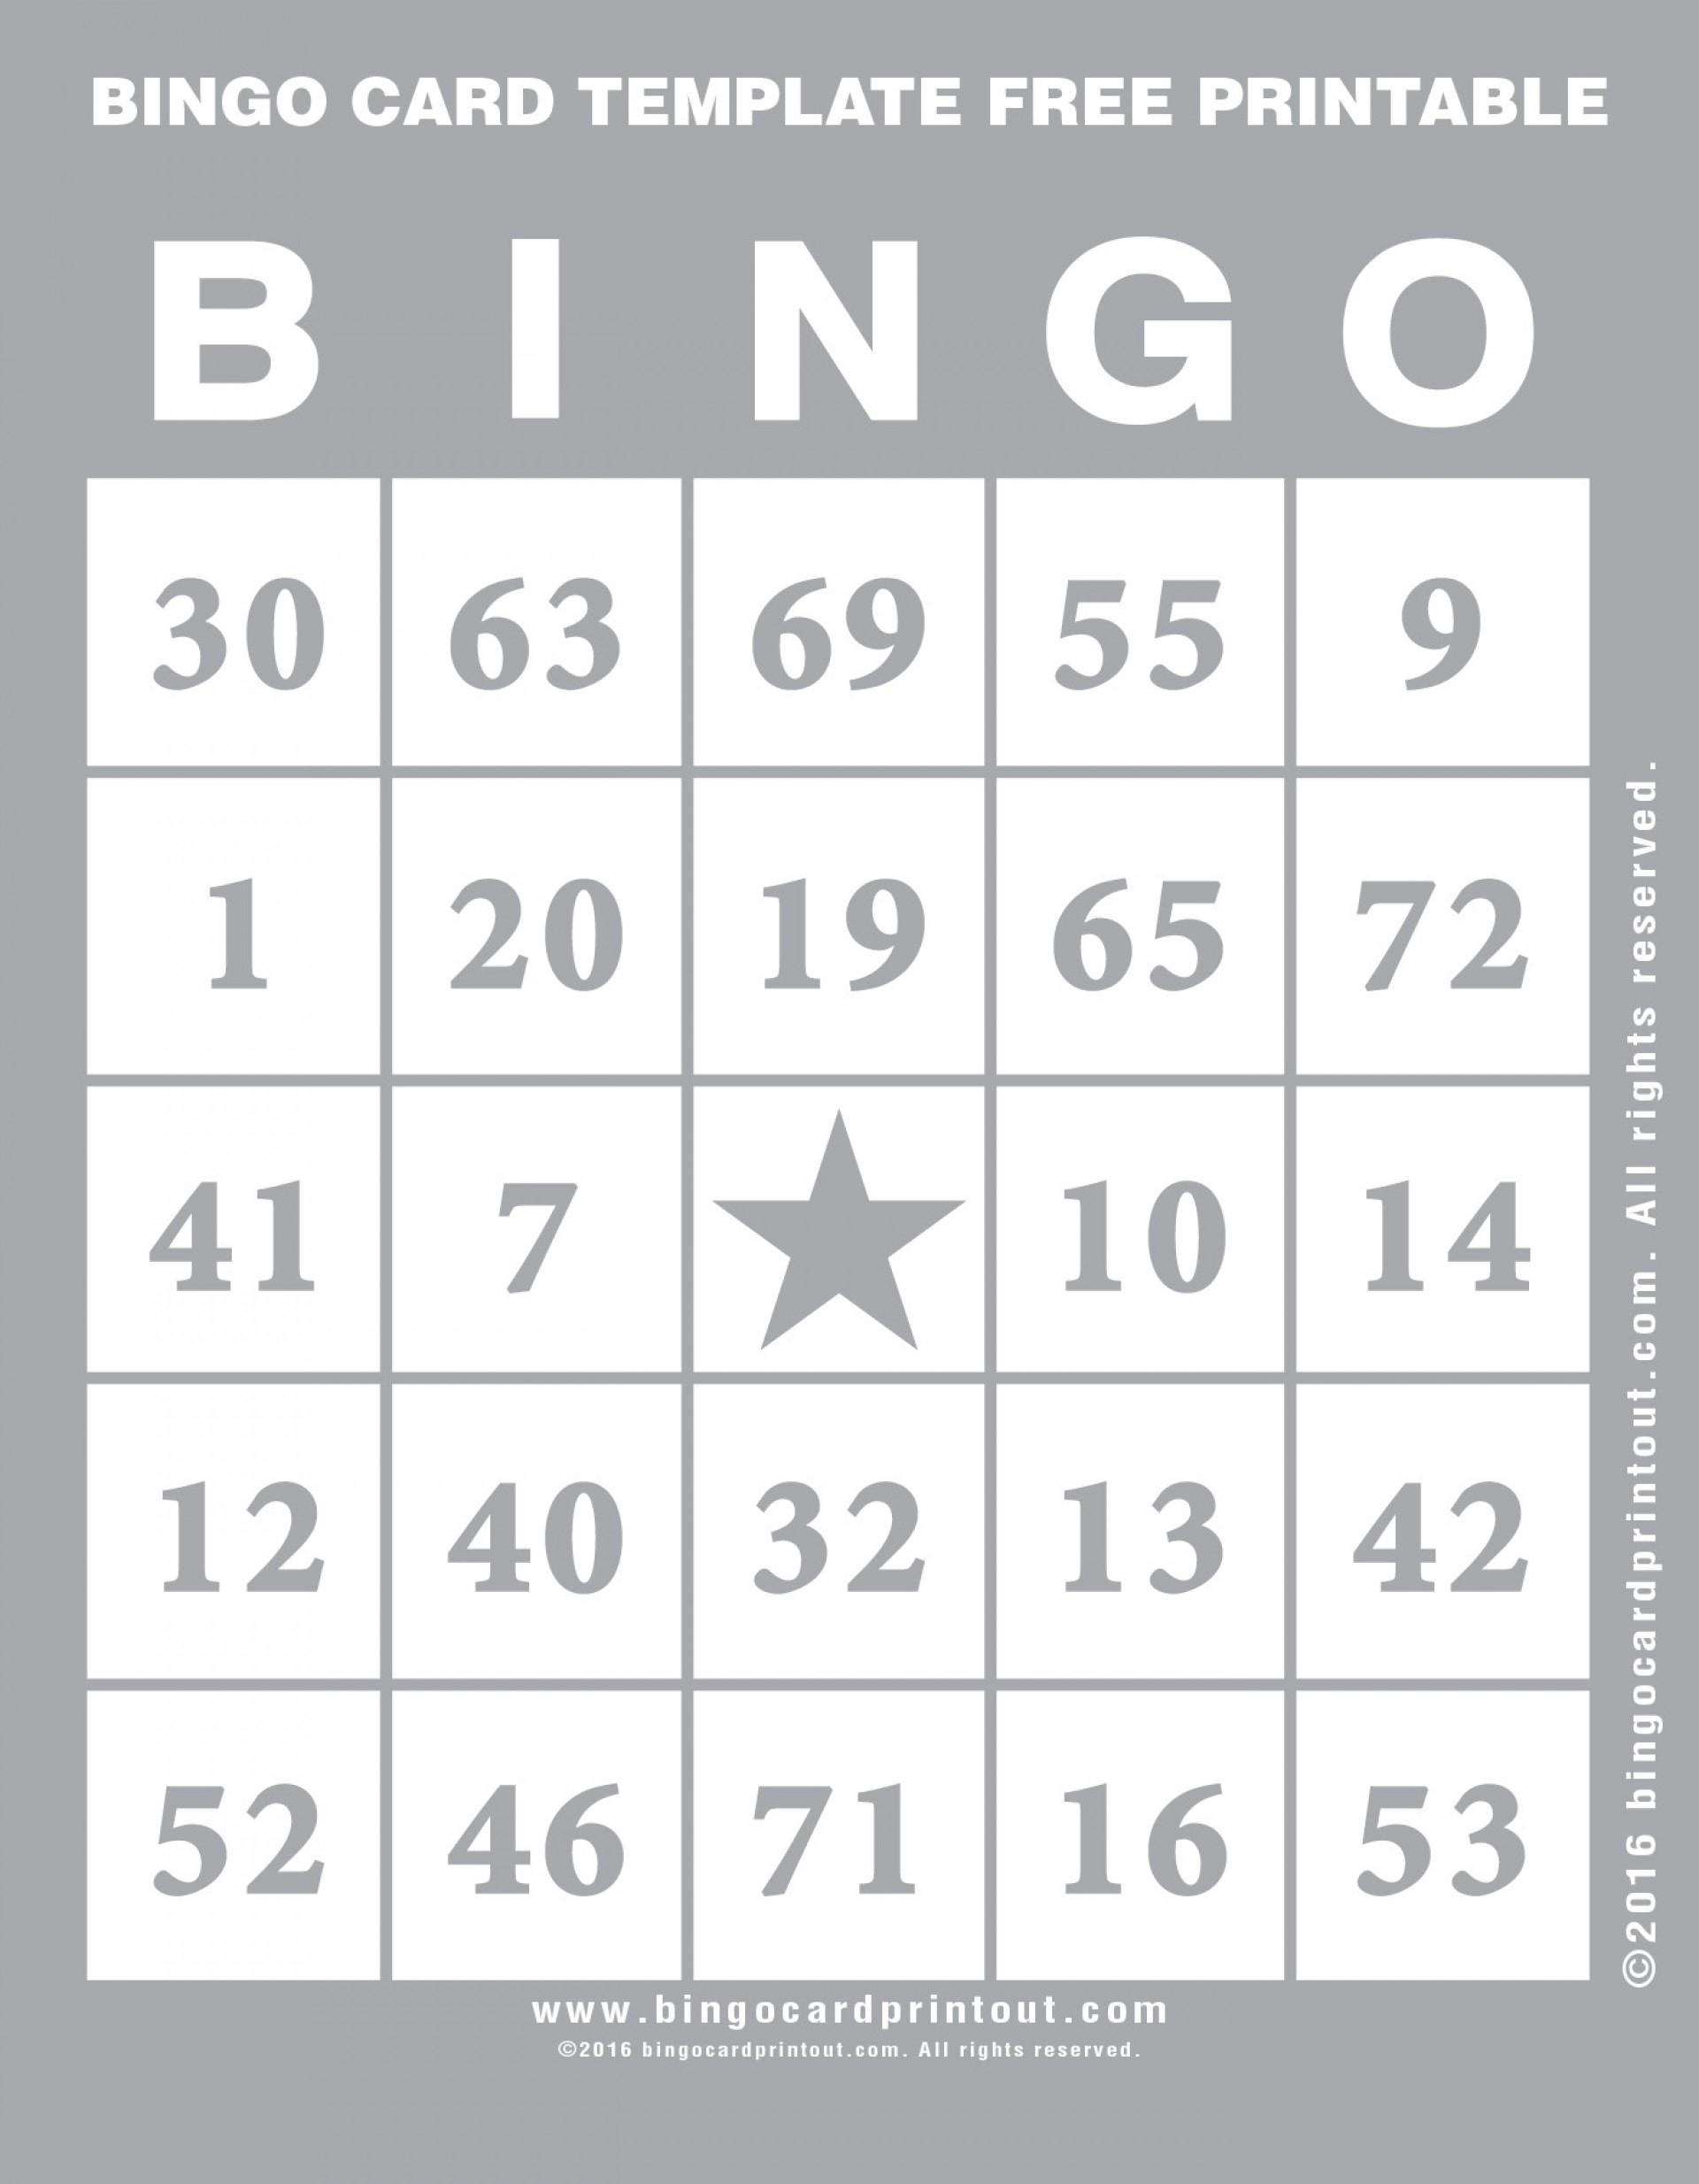 005 Template Ideas Bingo Card Free Printable ~ Ulyssesroom - Free Printable Bingo Cards For Teachers